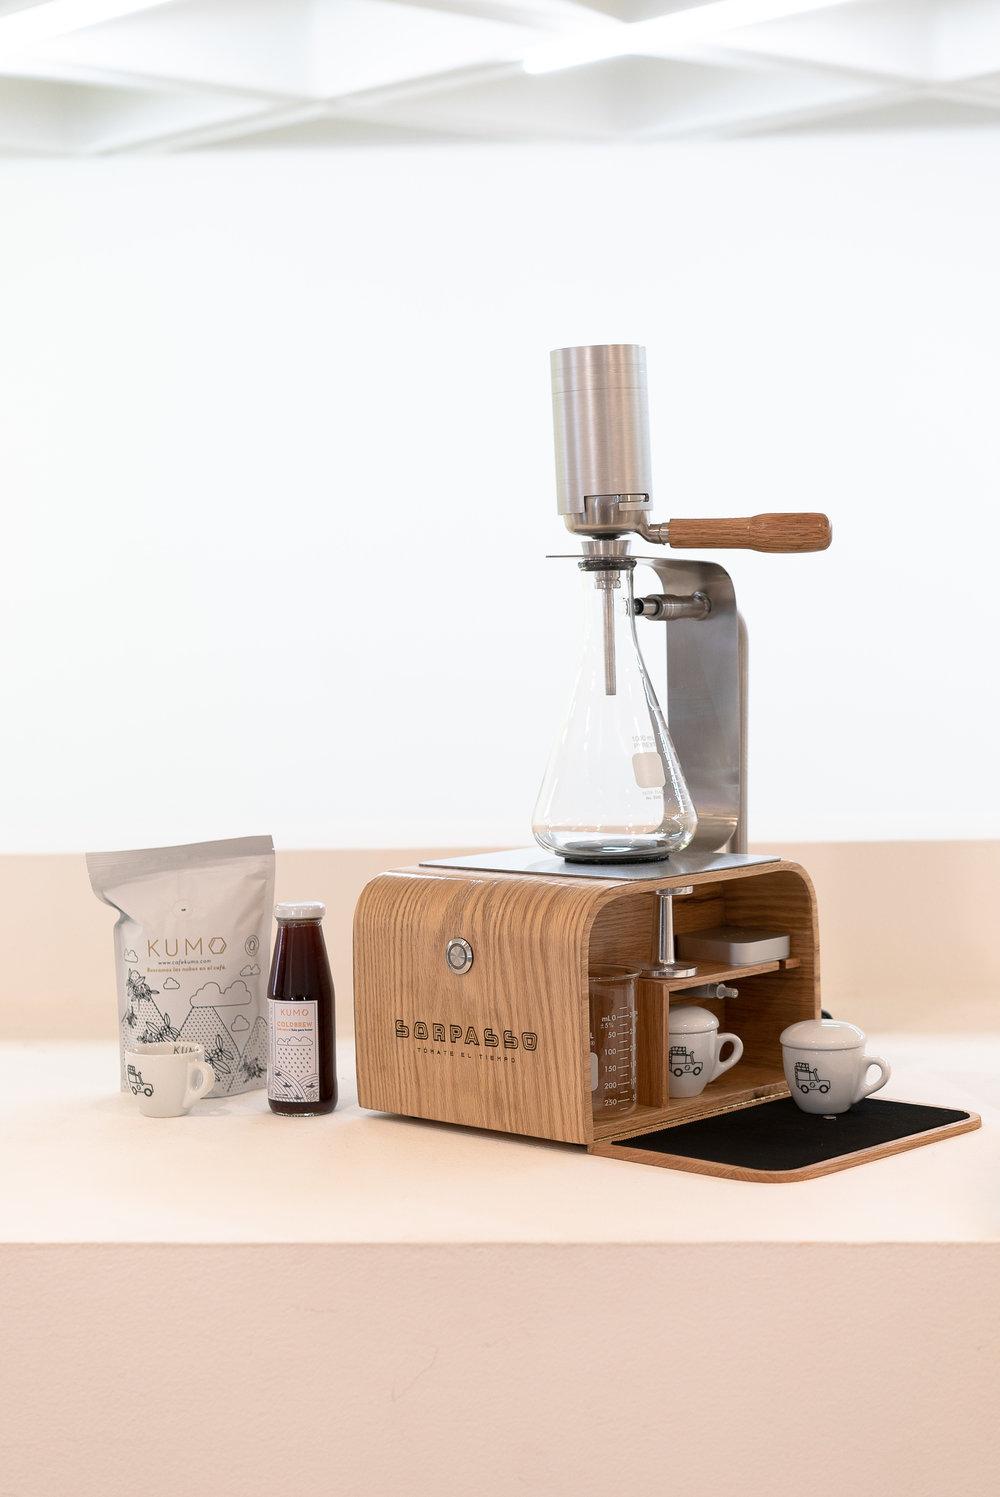 Sorpasso by Kumo Laboratorio de Café